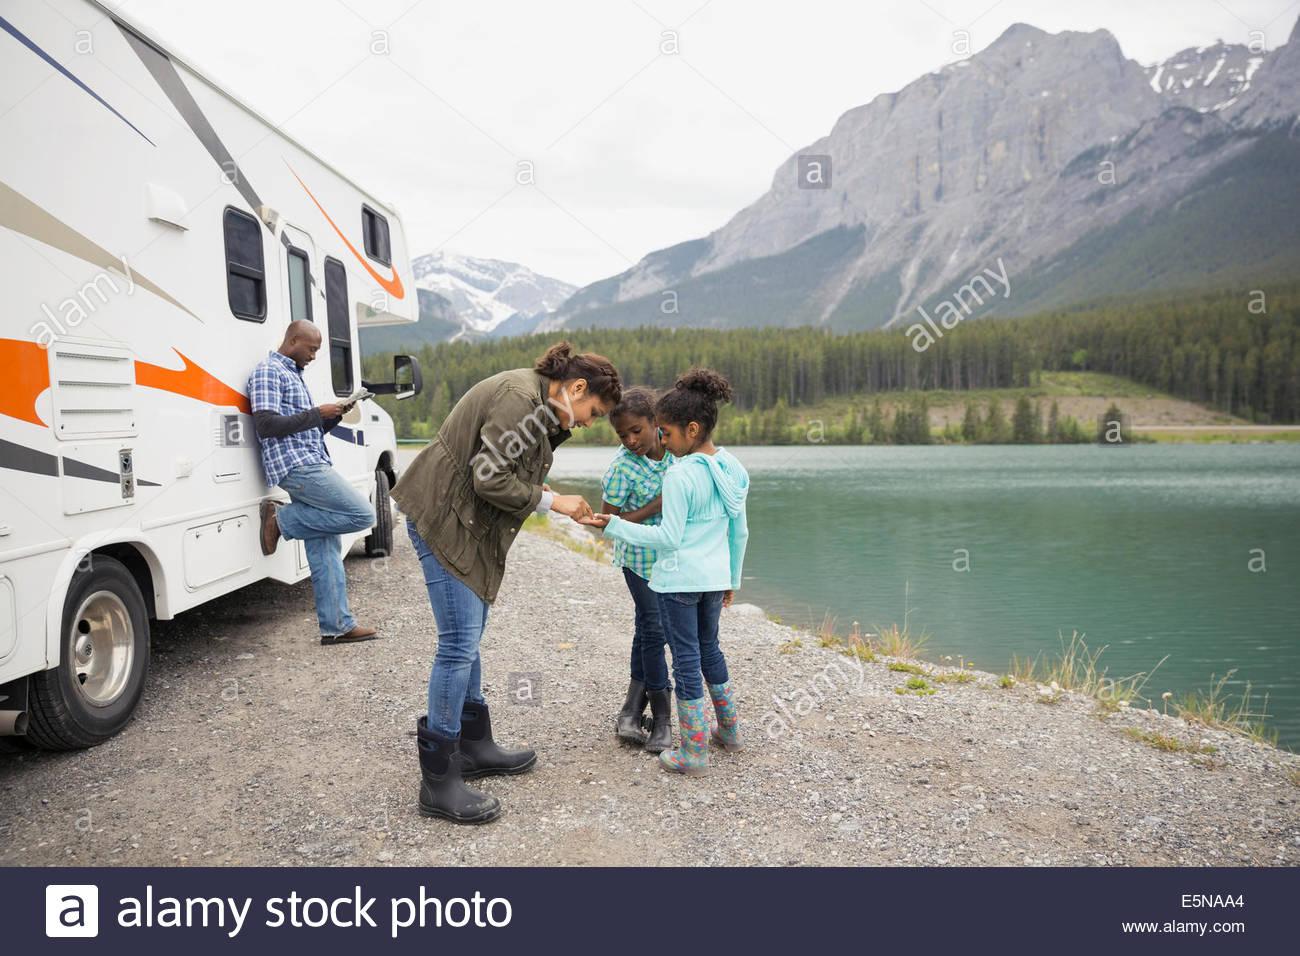 Familia de pie en lakeside cerca de RV Imagen De Stock